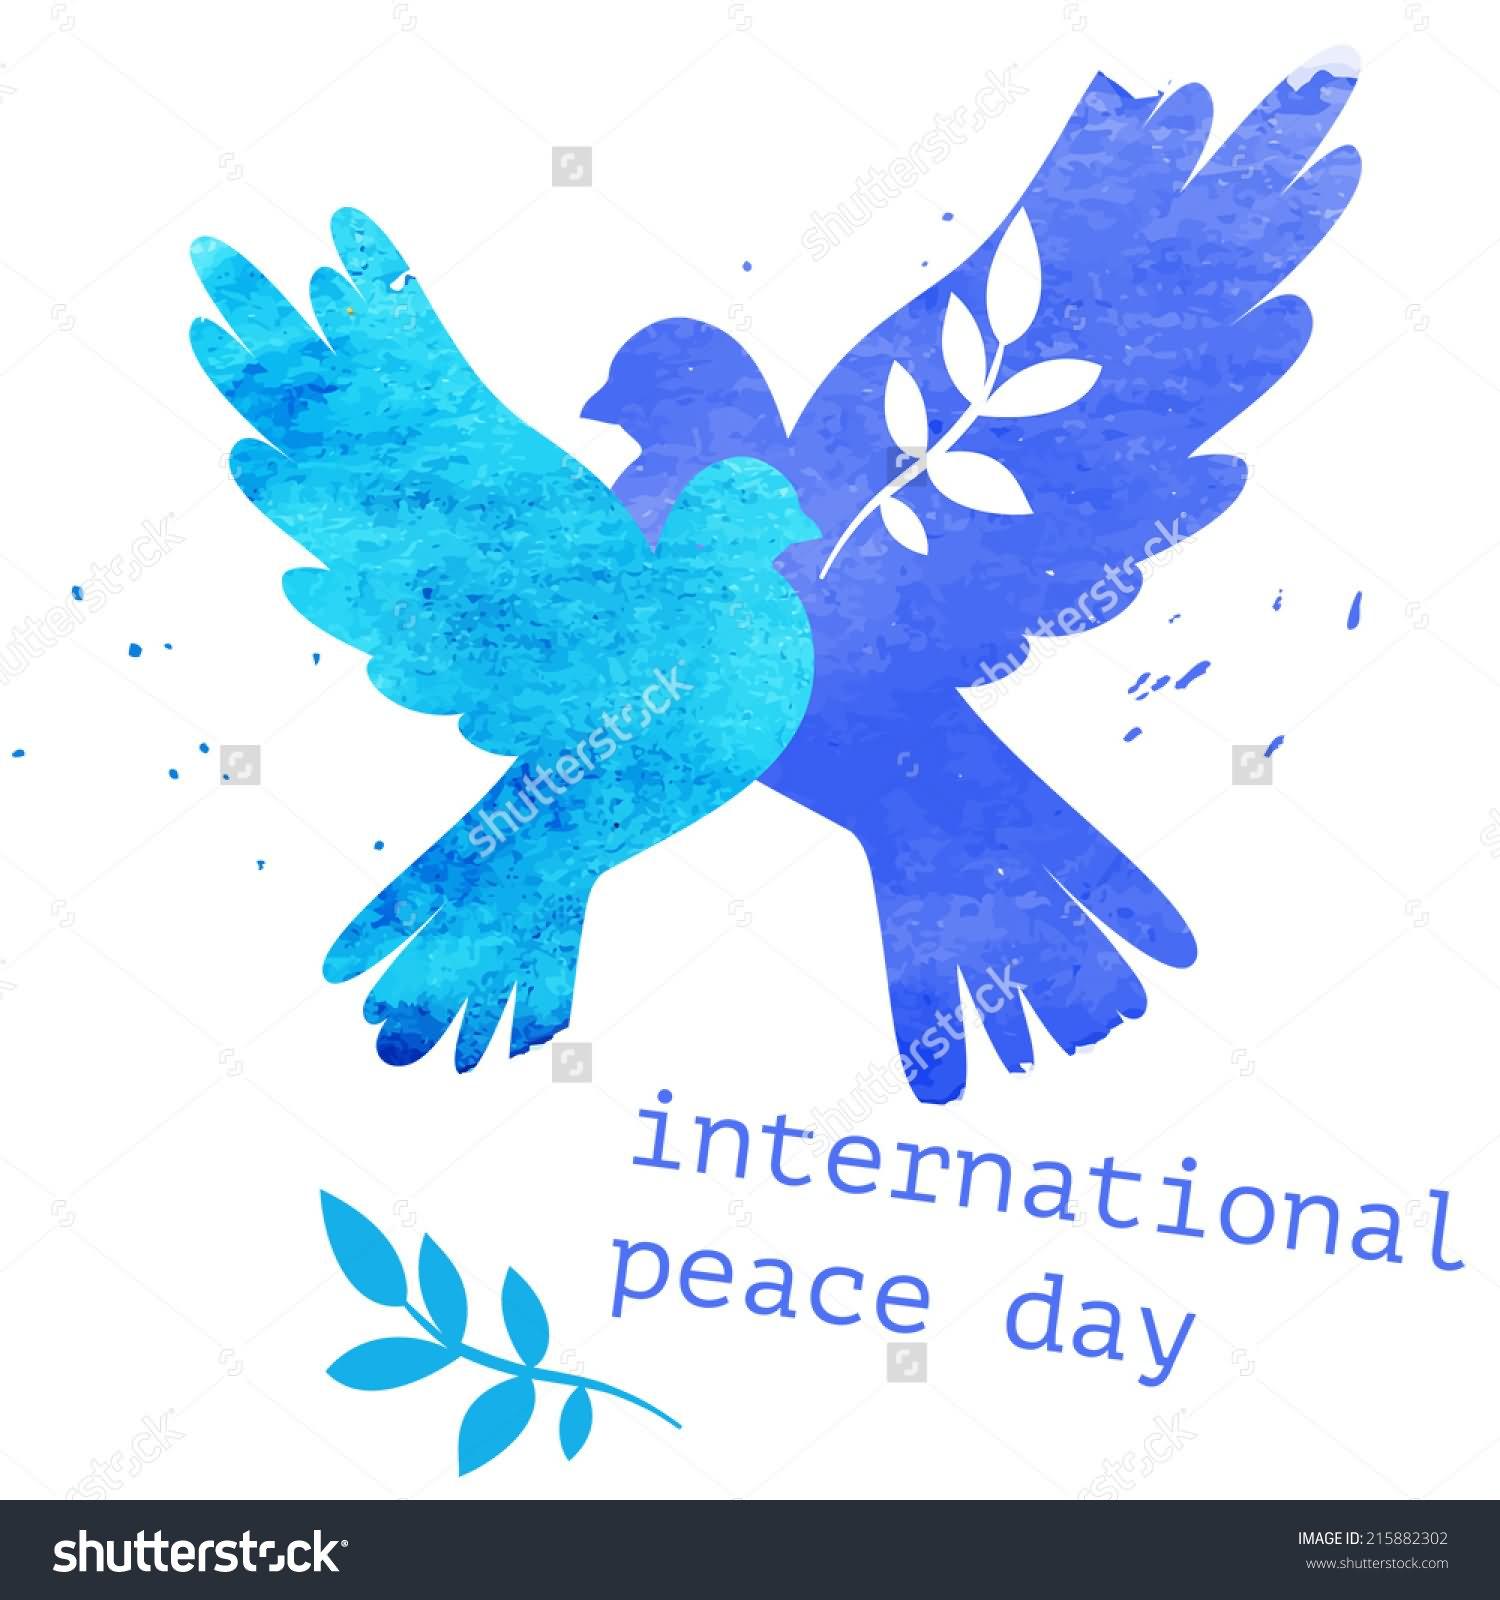 International Day of Peace Wallpaper 9   1500 X 1600 stmednet 1500x1600